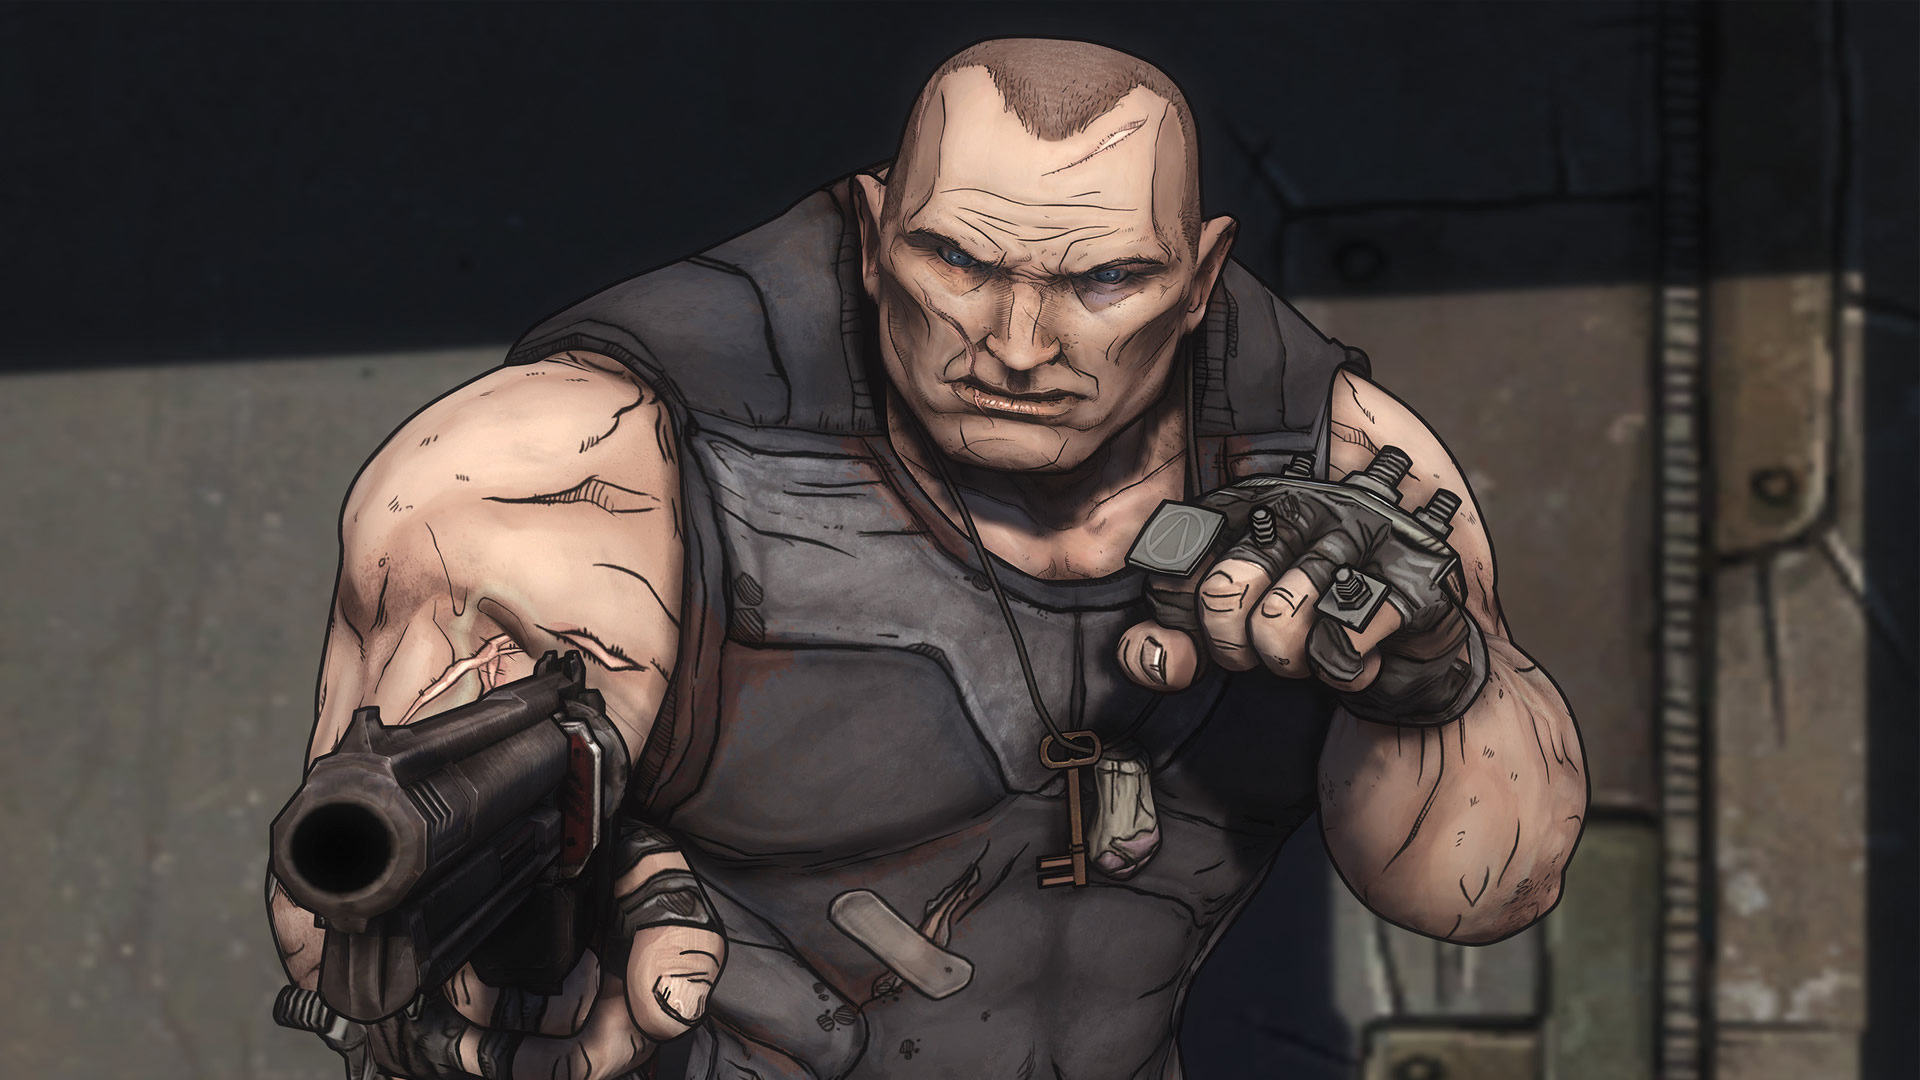 [Futuristic] Bringing life to a transhuman thug ... Borderlands Characters Brick